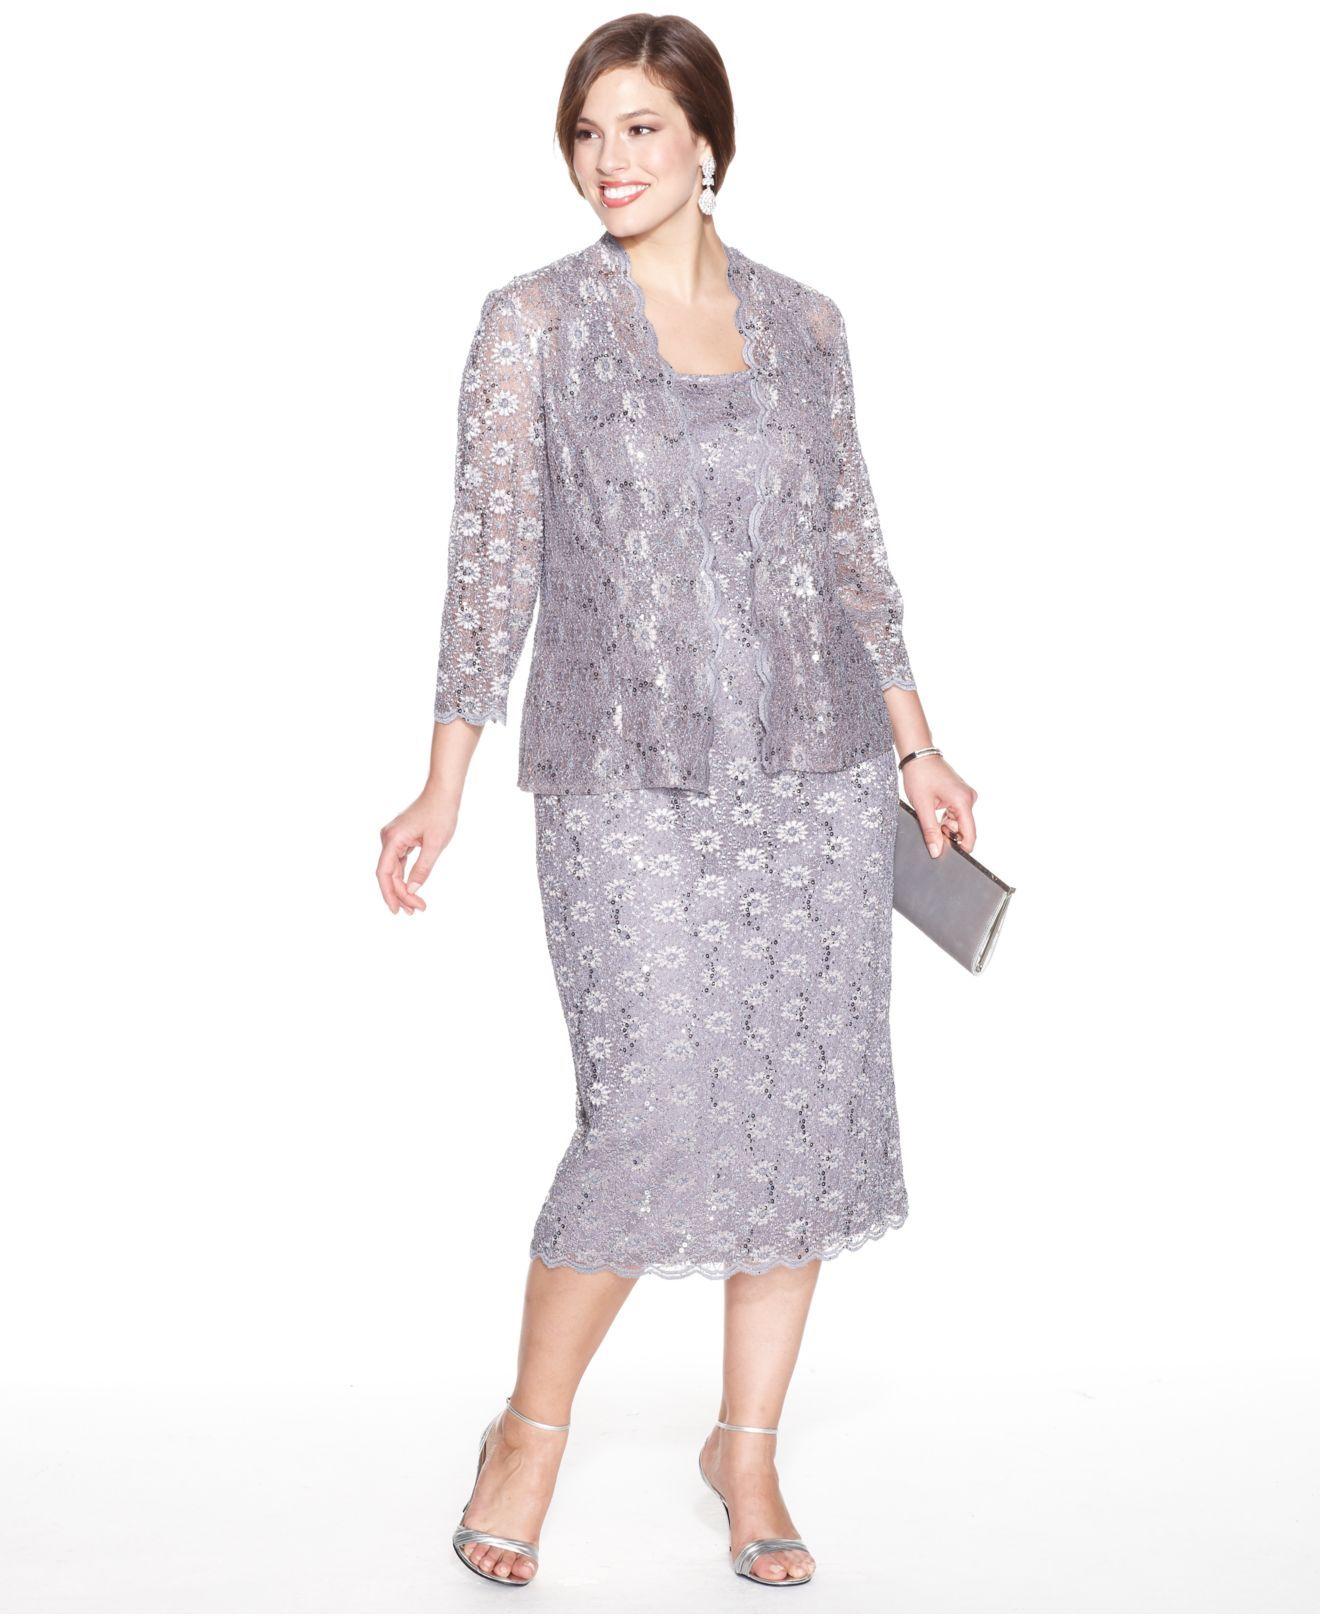 Best dresses to wear to a march wedding  Lace dress denim jacket x  Good style dresses  Pinterest